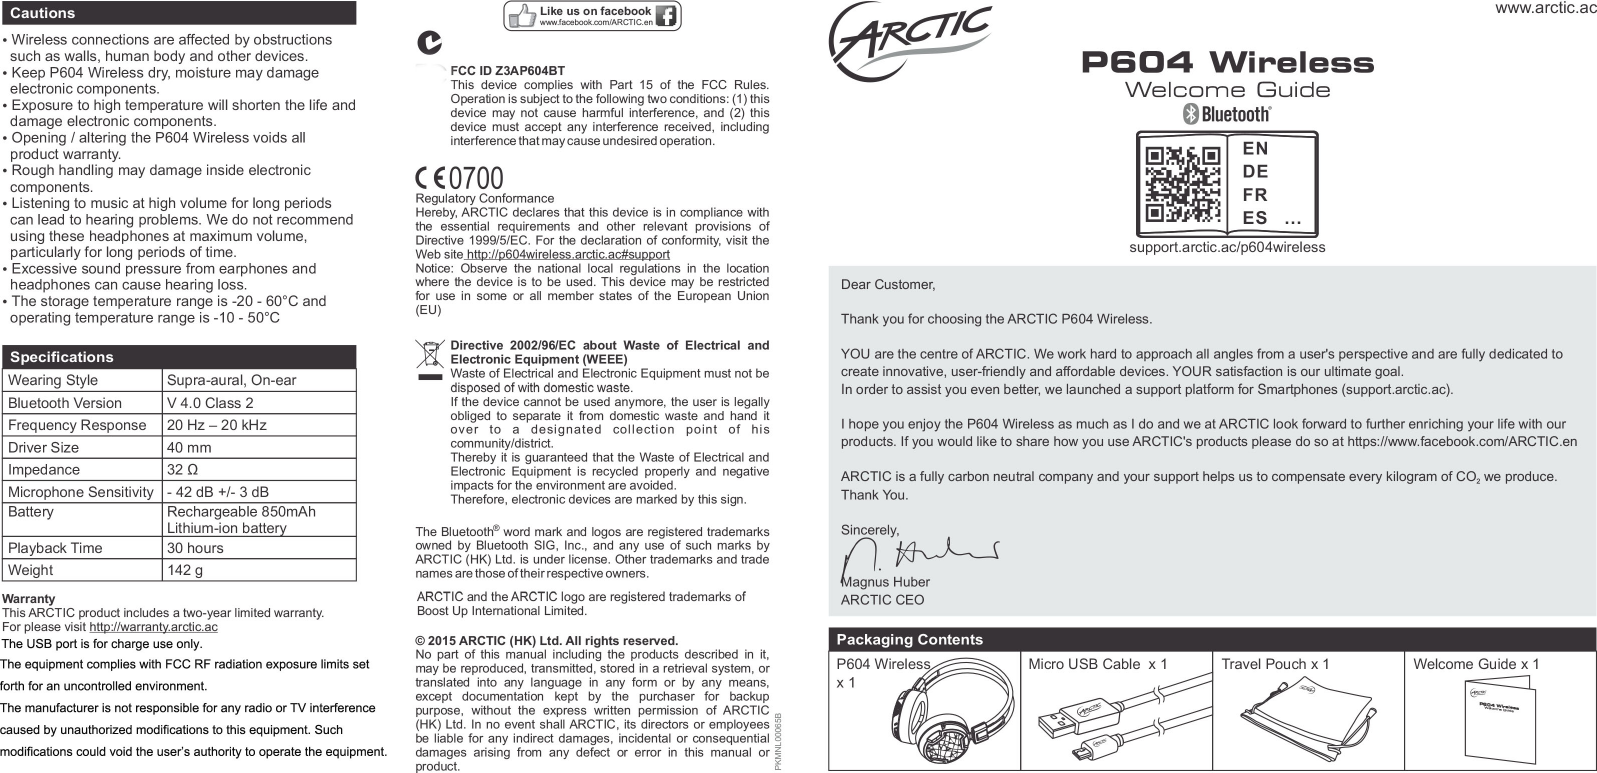 arctic p604bt dynamic bluetooth 4 0 headphones user manual welcome rh usermanual wiki arctic spa user manual arctic spa user manual